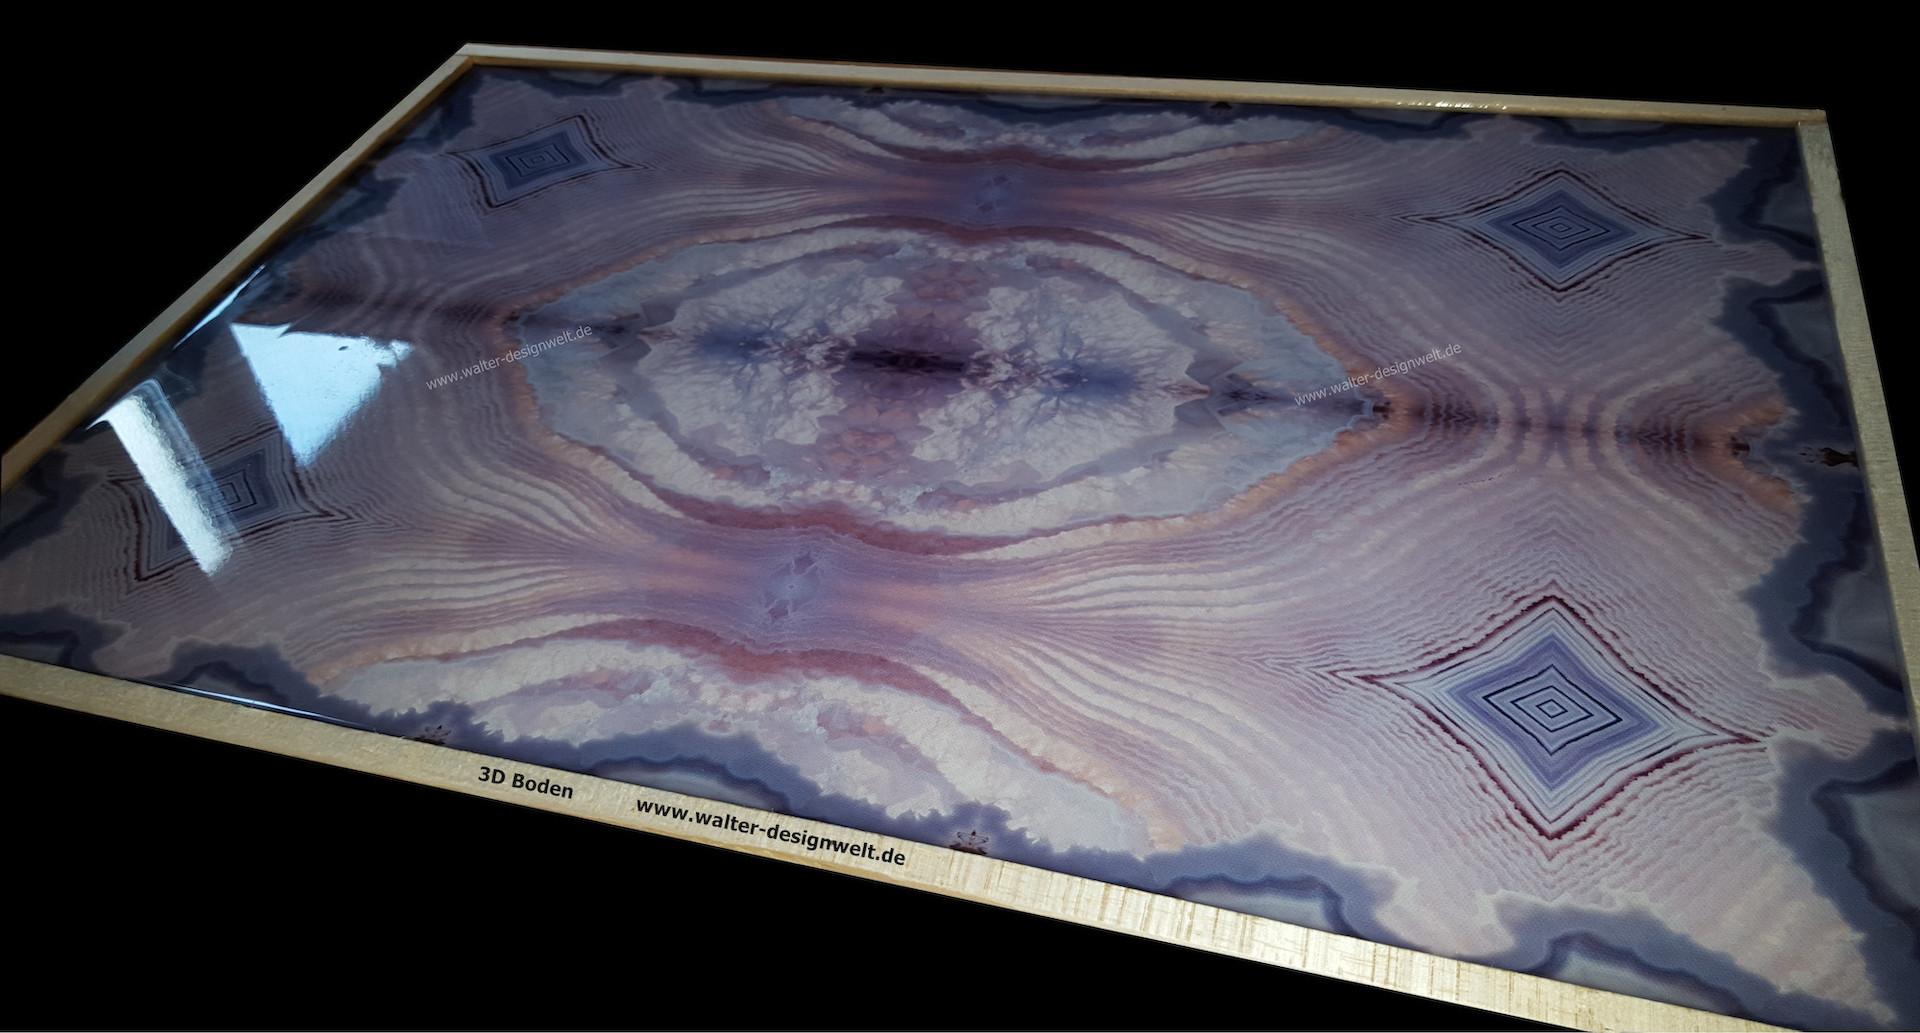 Motiv Fußboden 3d ~ Epoxy d boden walter designwelt